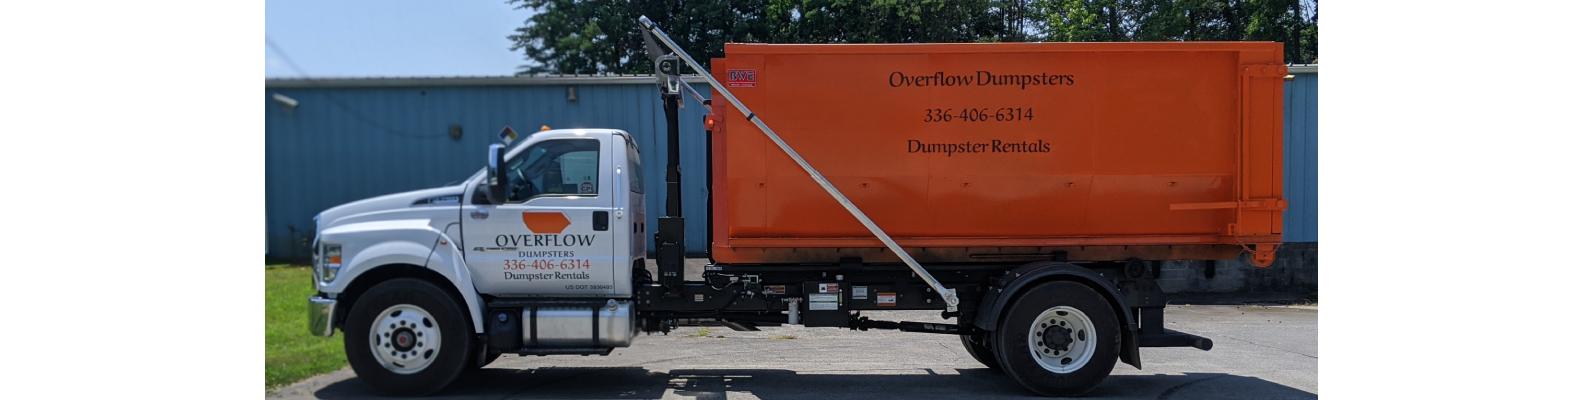 Dumpster Rental Lewisville, NC